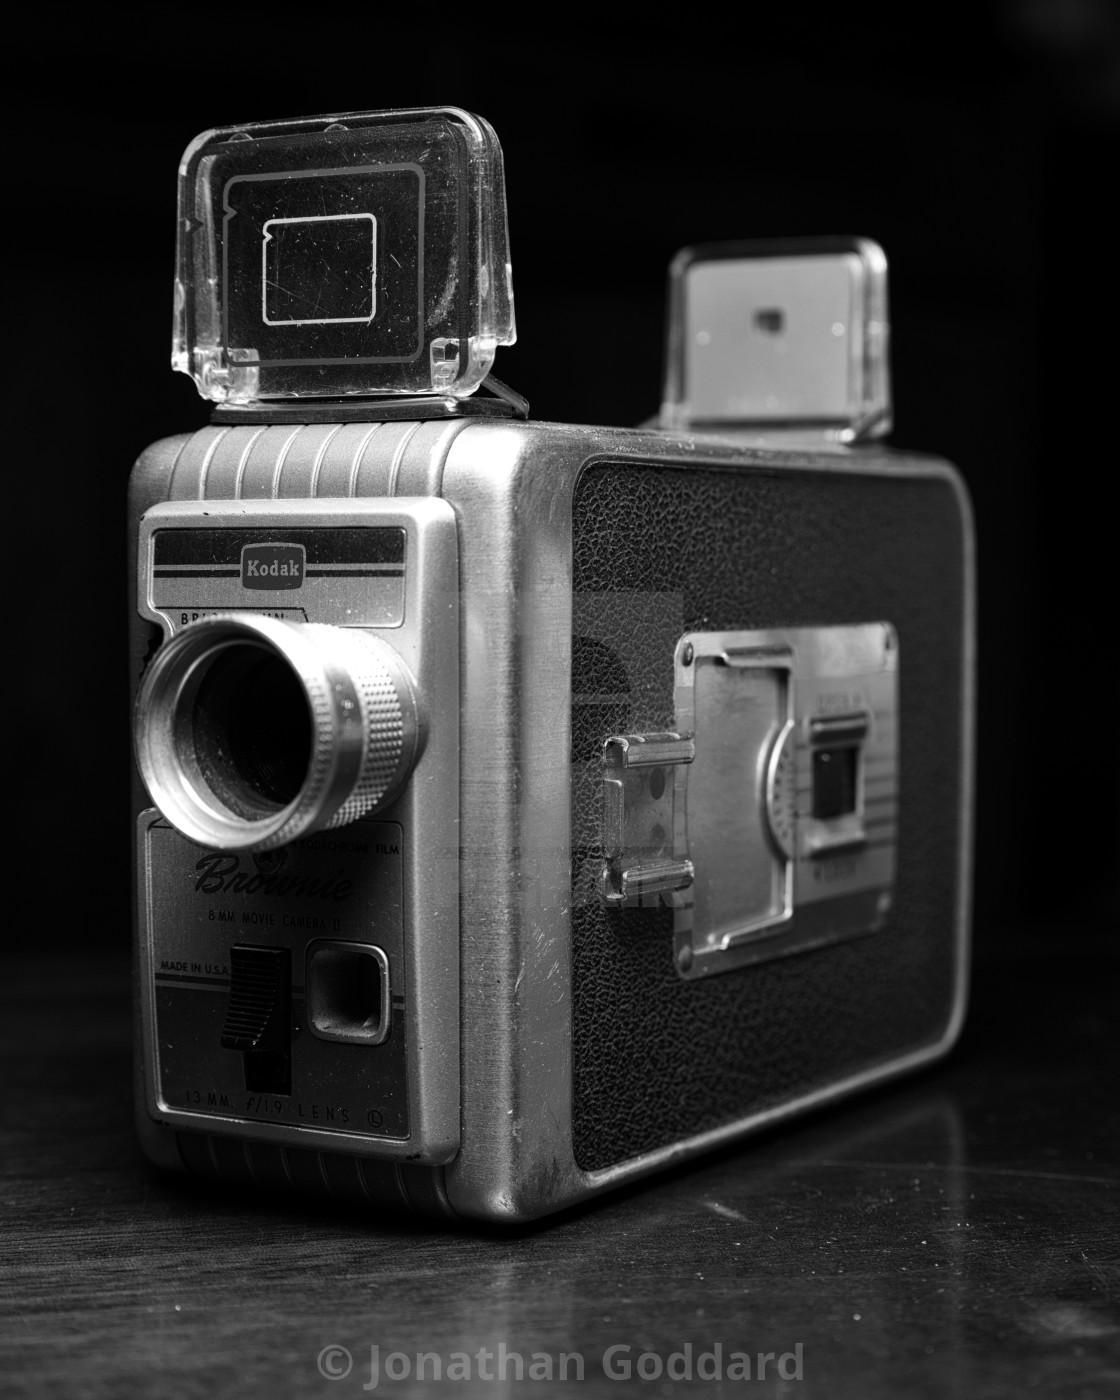 8Mm Vintage Camera vintage camera: kodak brownie 8mm movie camera - license